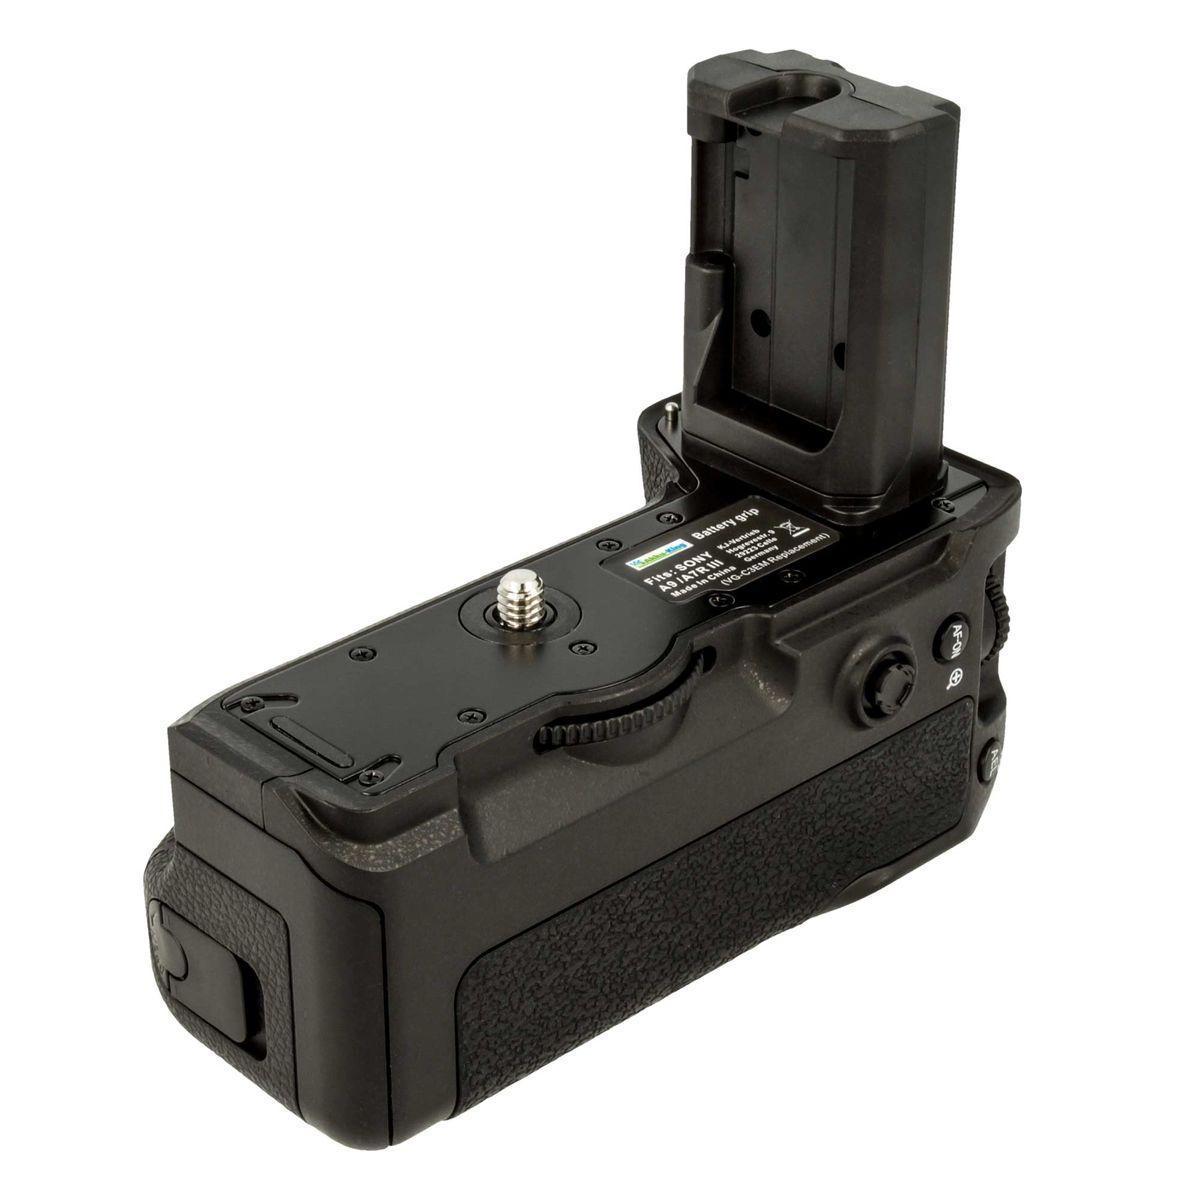 inkl 2X Akku NP-FZ100 a7S III 7M3 a7RM3 a7R III a7 III ersetzt VG-C3EM Akku-King Batteriegriff Set f/ür Sony Alpha a9 Bedienelemente am Griff